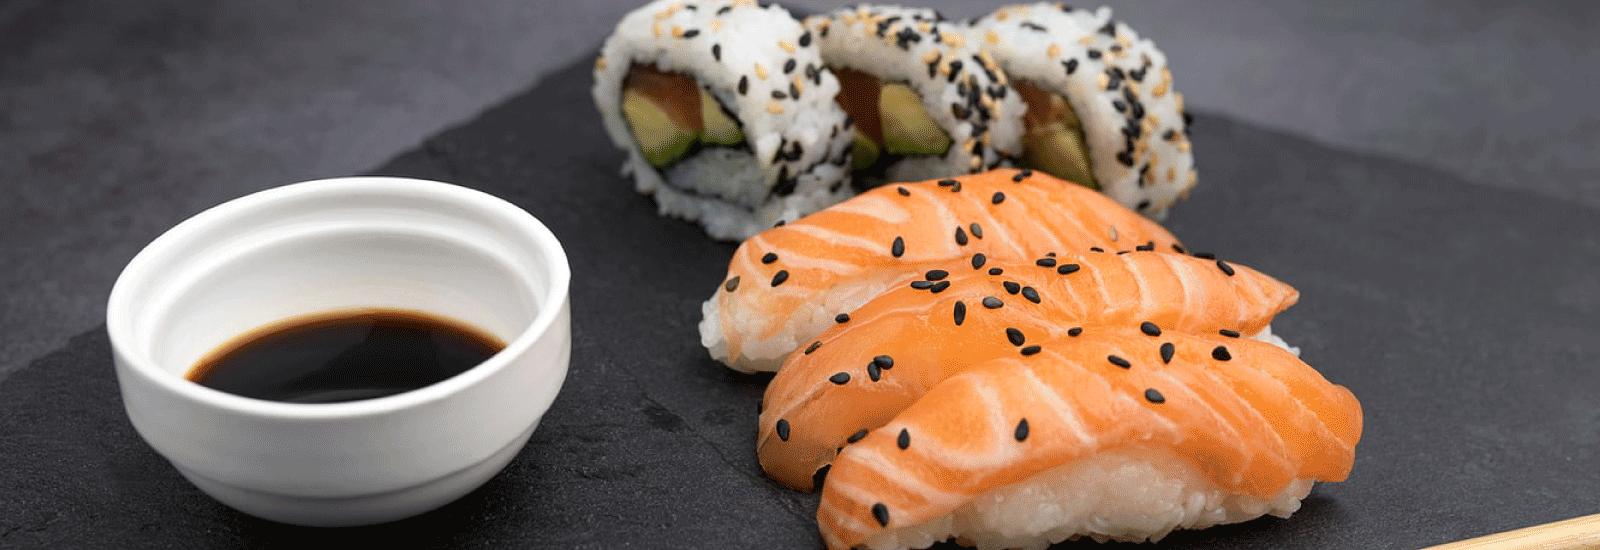 Japanese Cuisine Near Naval Station Great Lakes